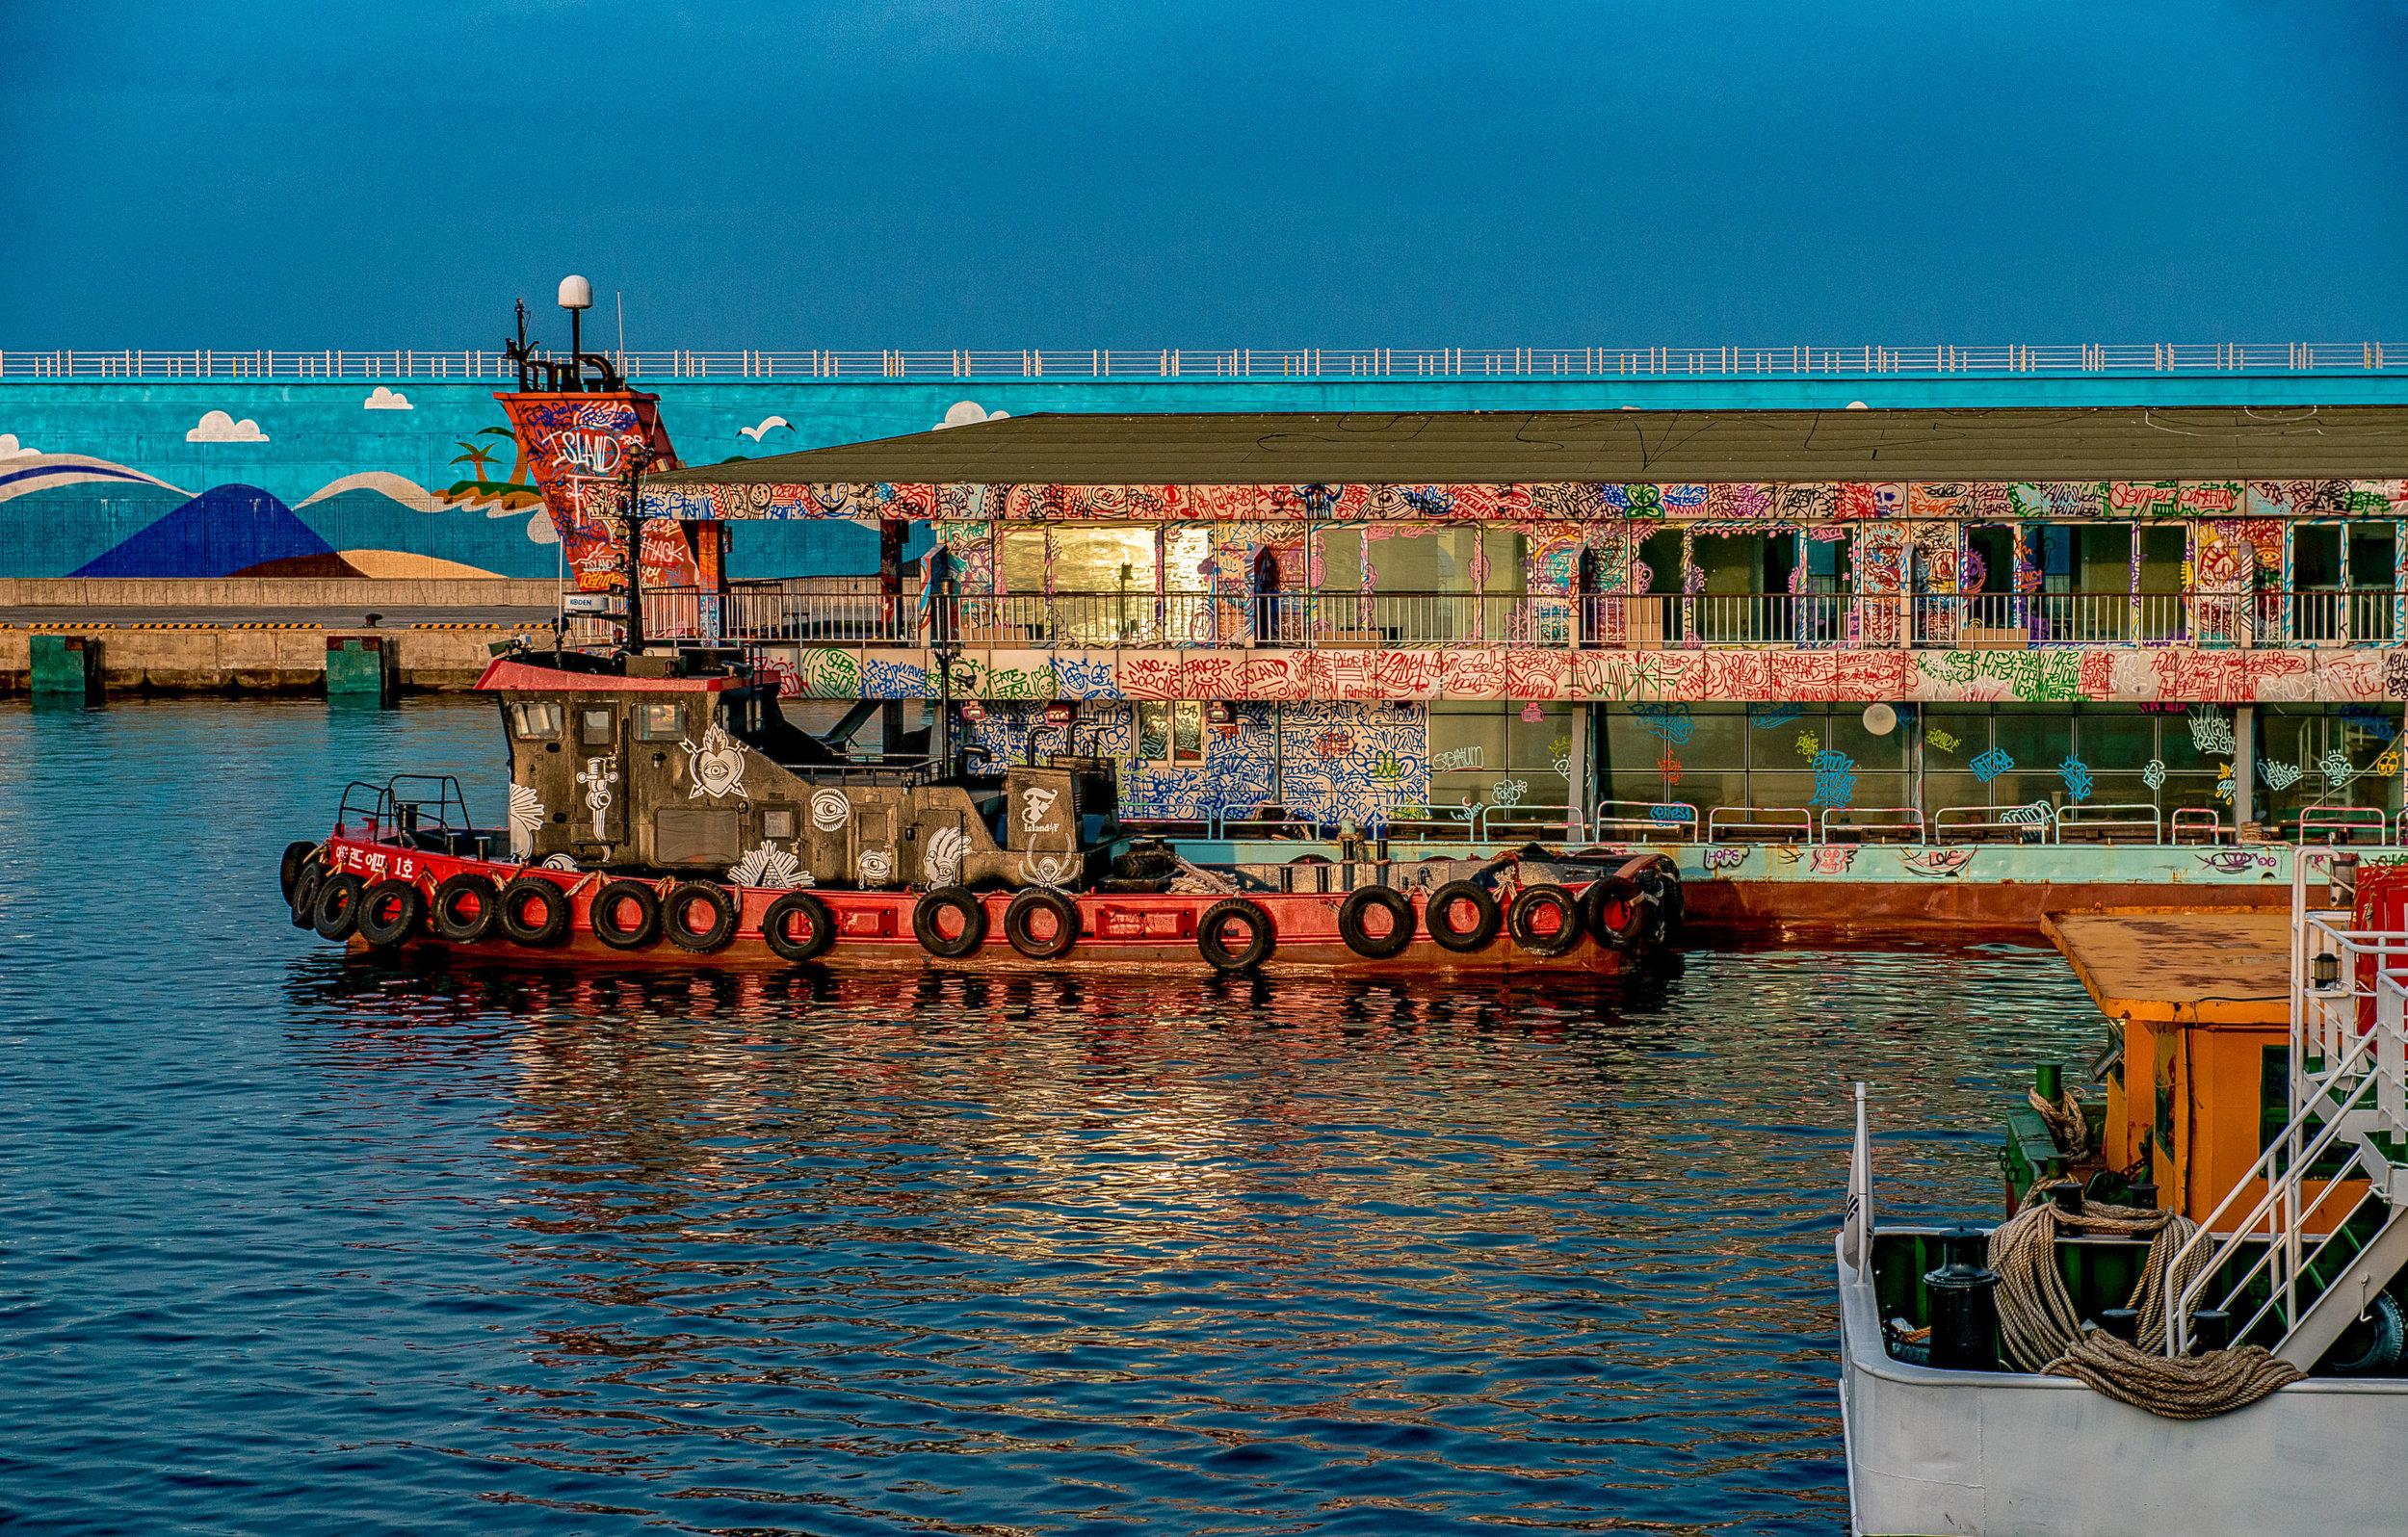 The Graffiti Ferry